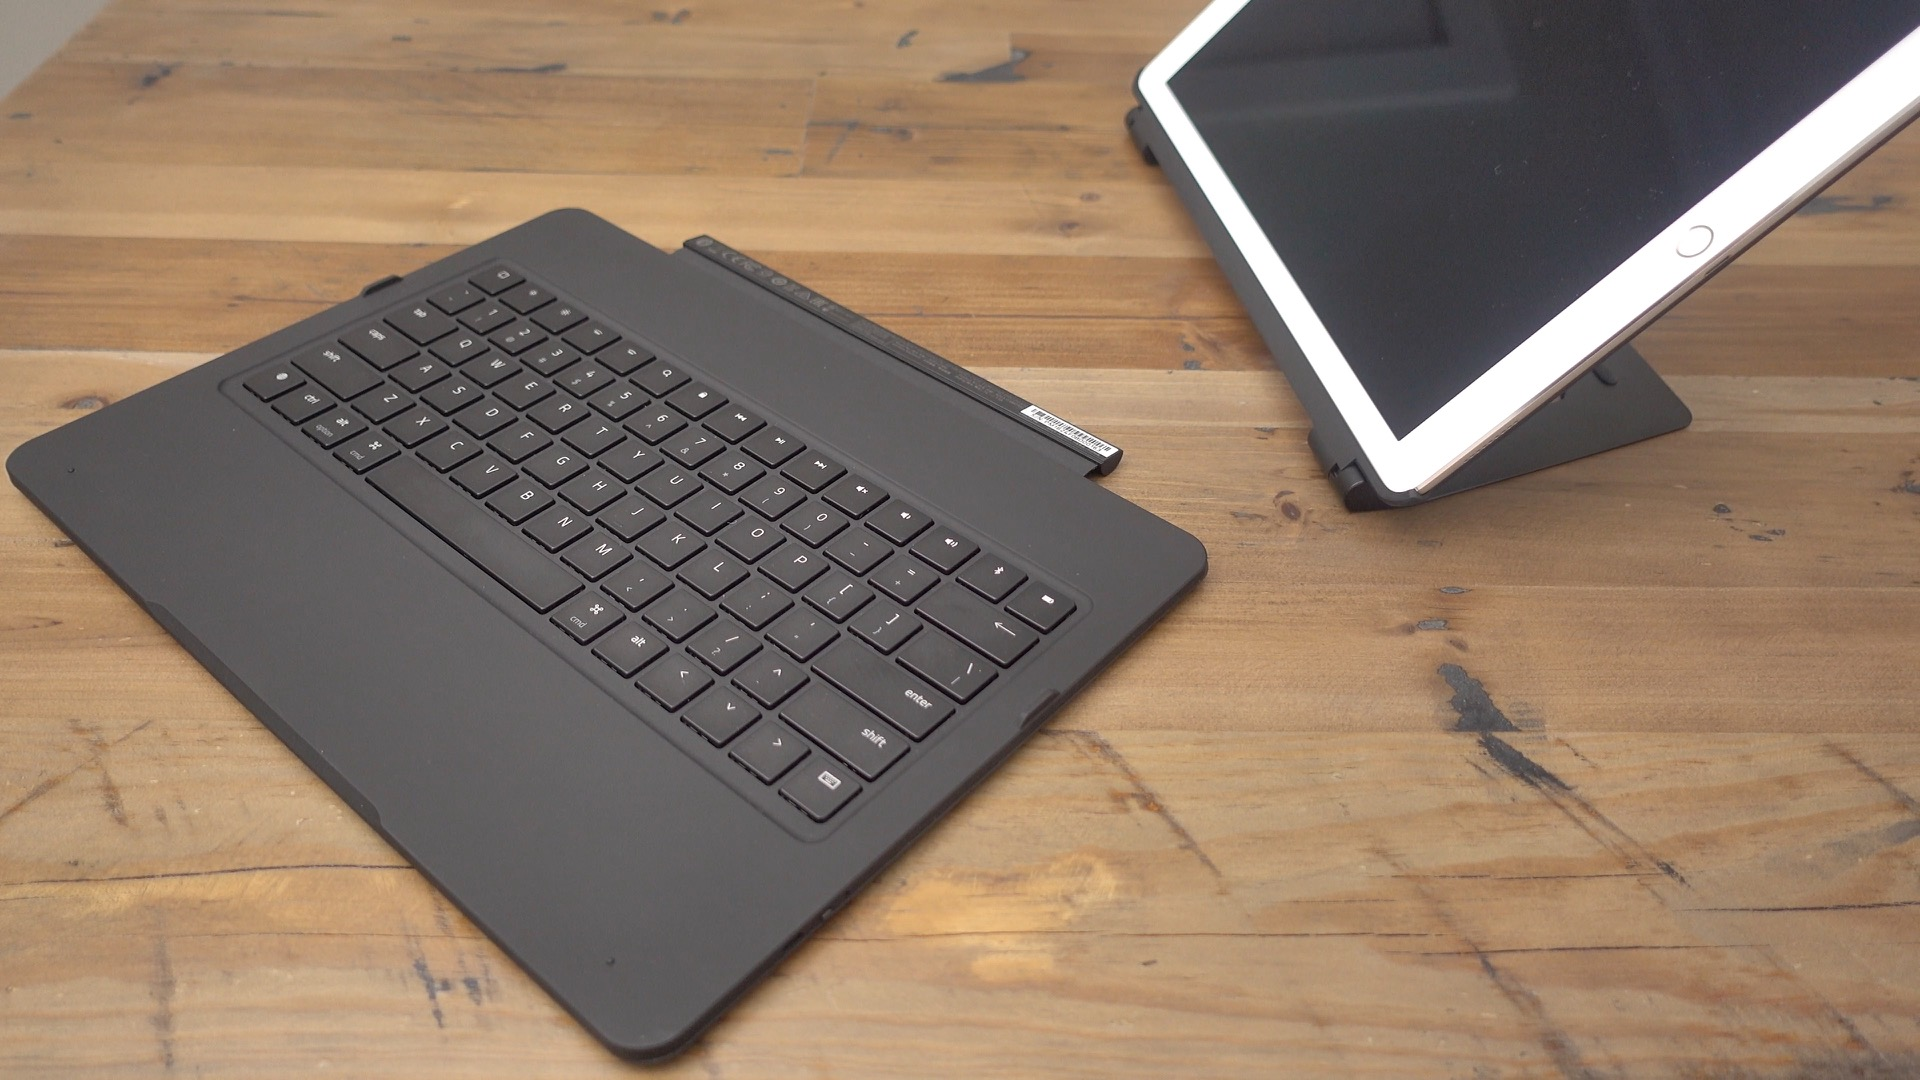 Detached Razer Keyboard Case iPad Pro